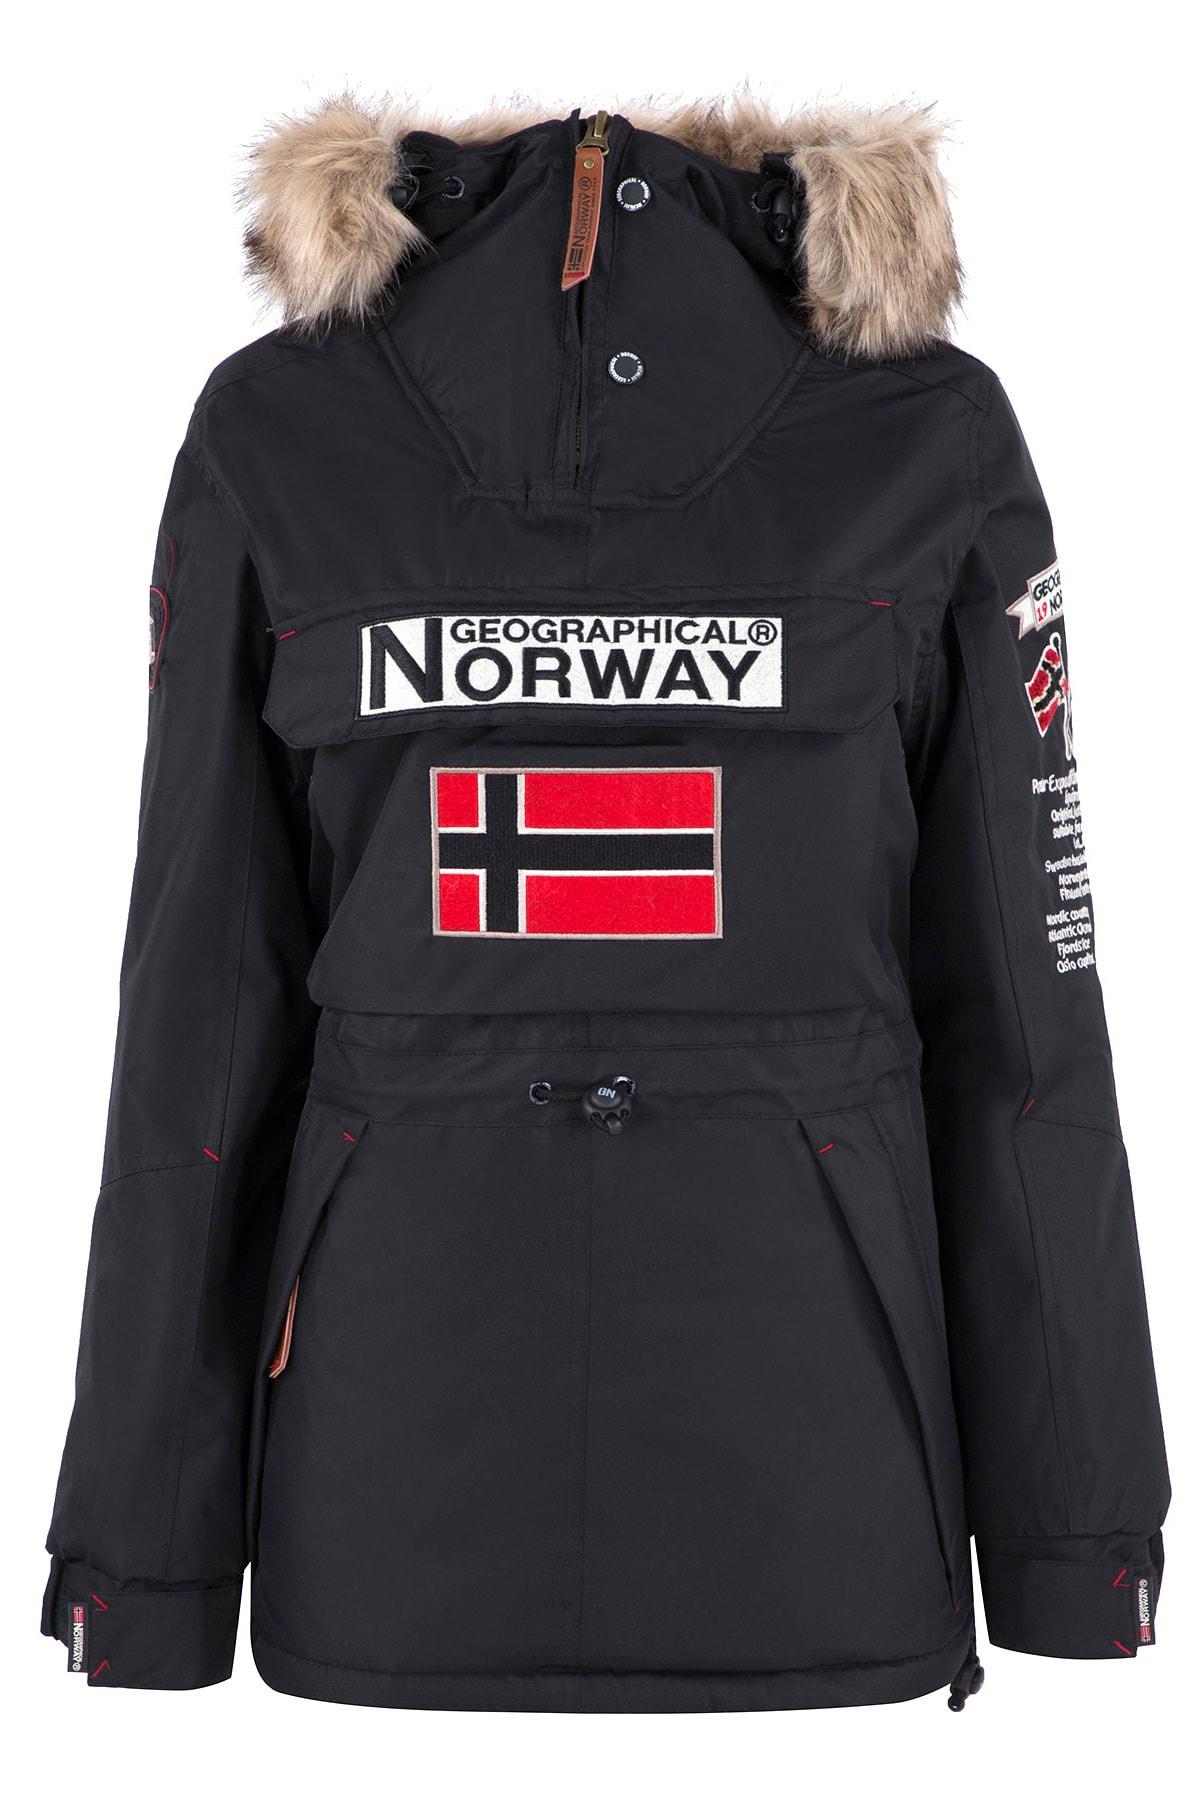 Norway Geographical Kadın Siyah Parka BOOMERA 1